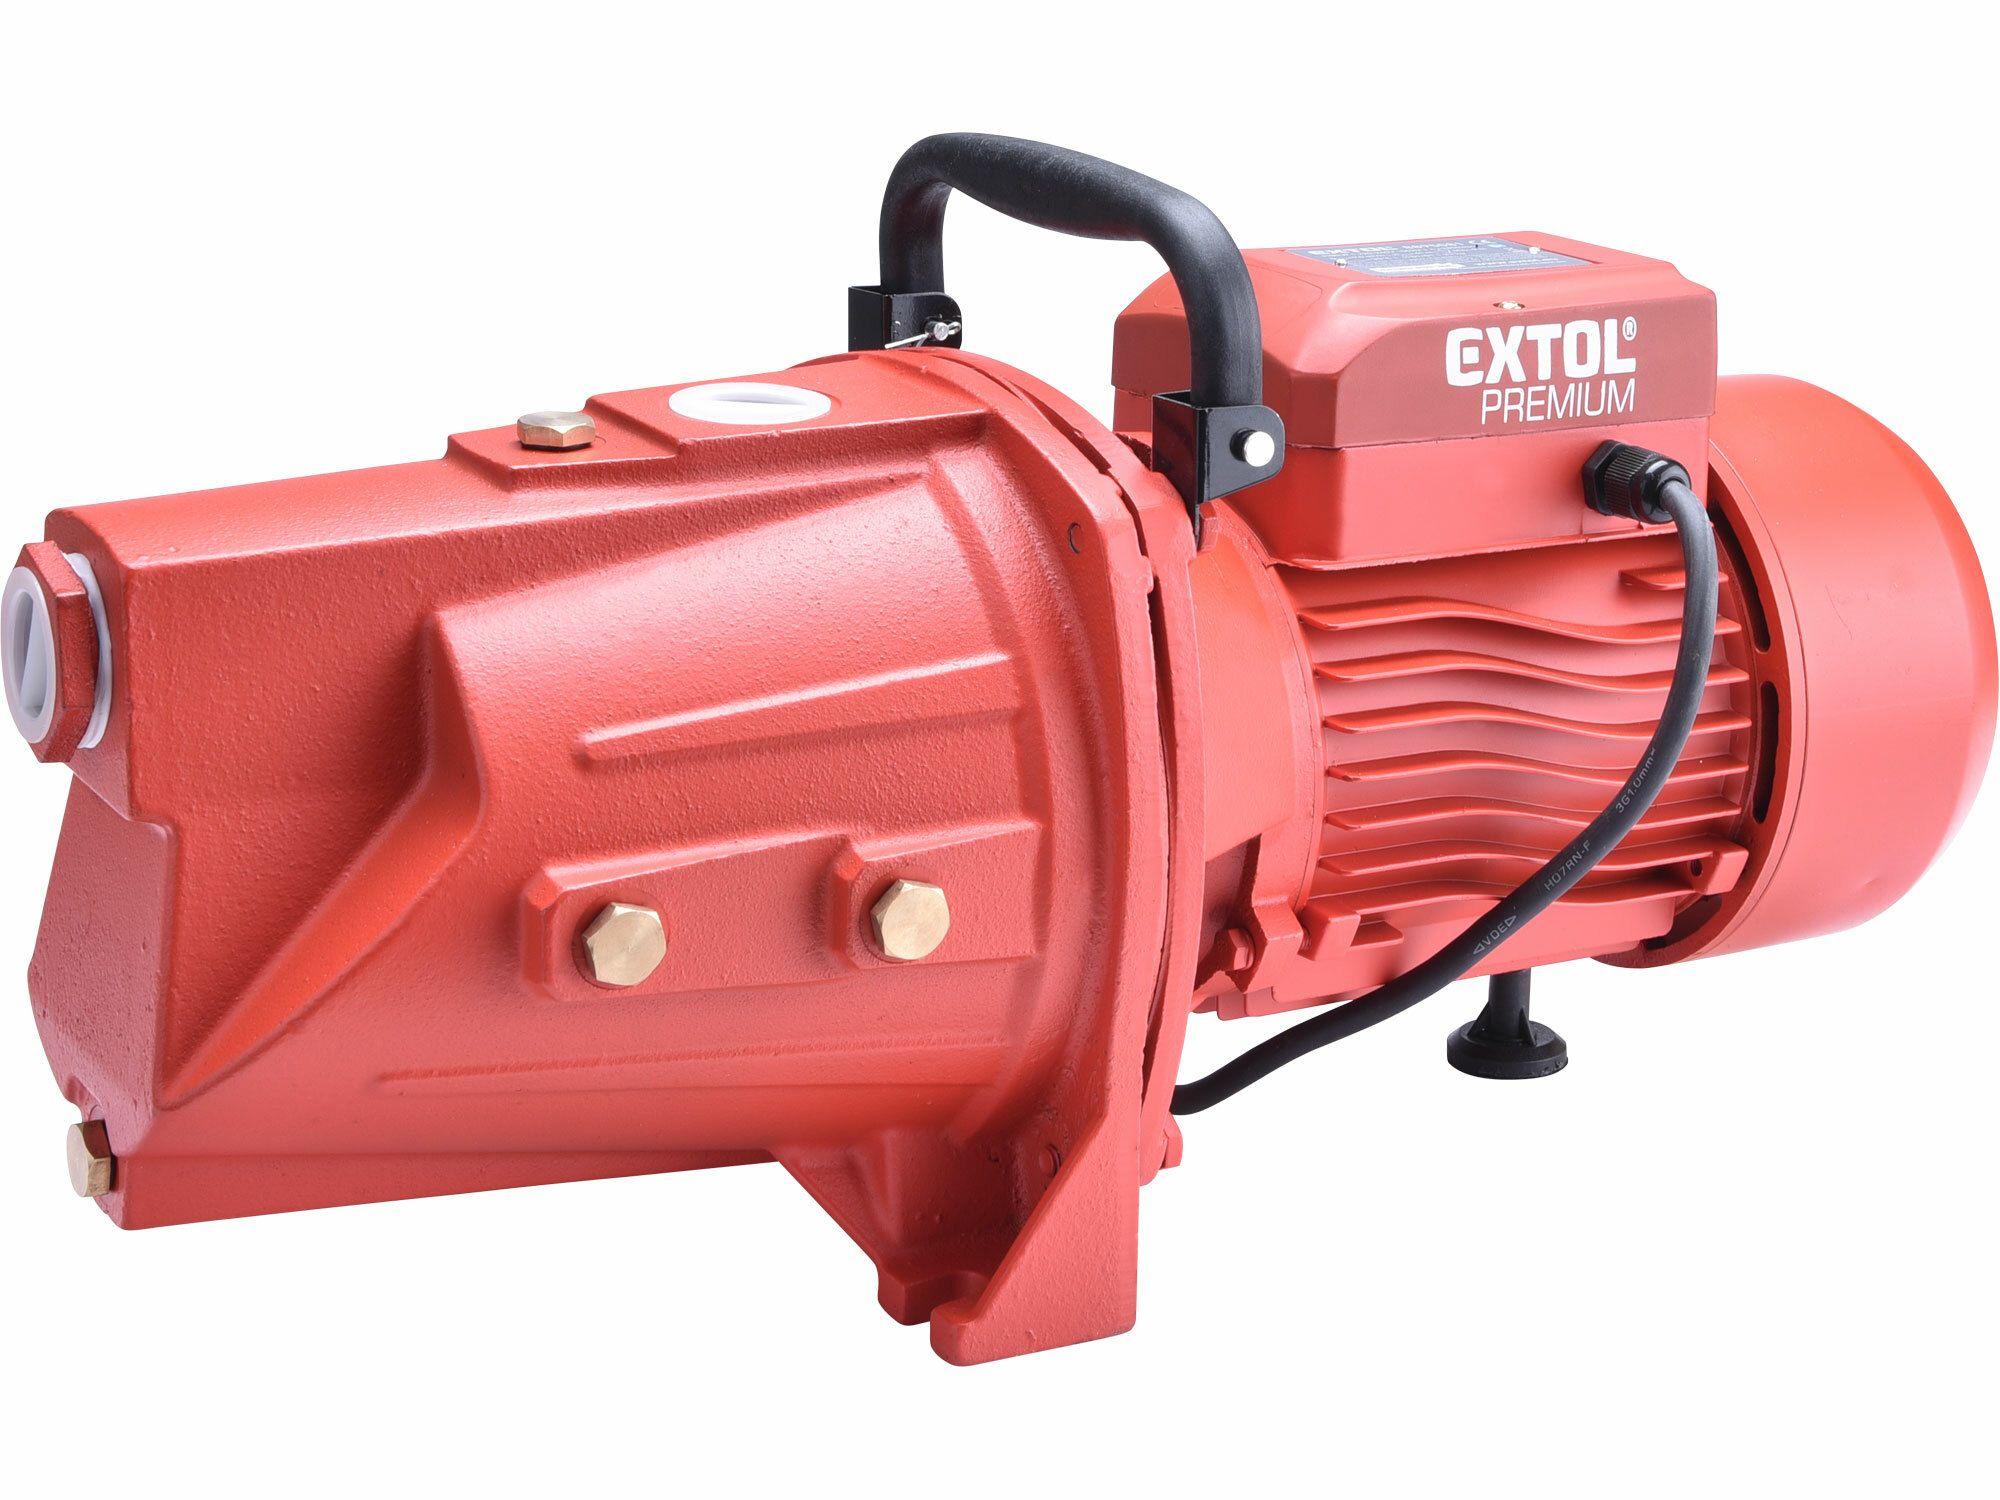 Čerpadlo proudové, 1100W, 9500l/hod, EXTOL PREMIUM, 8895081